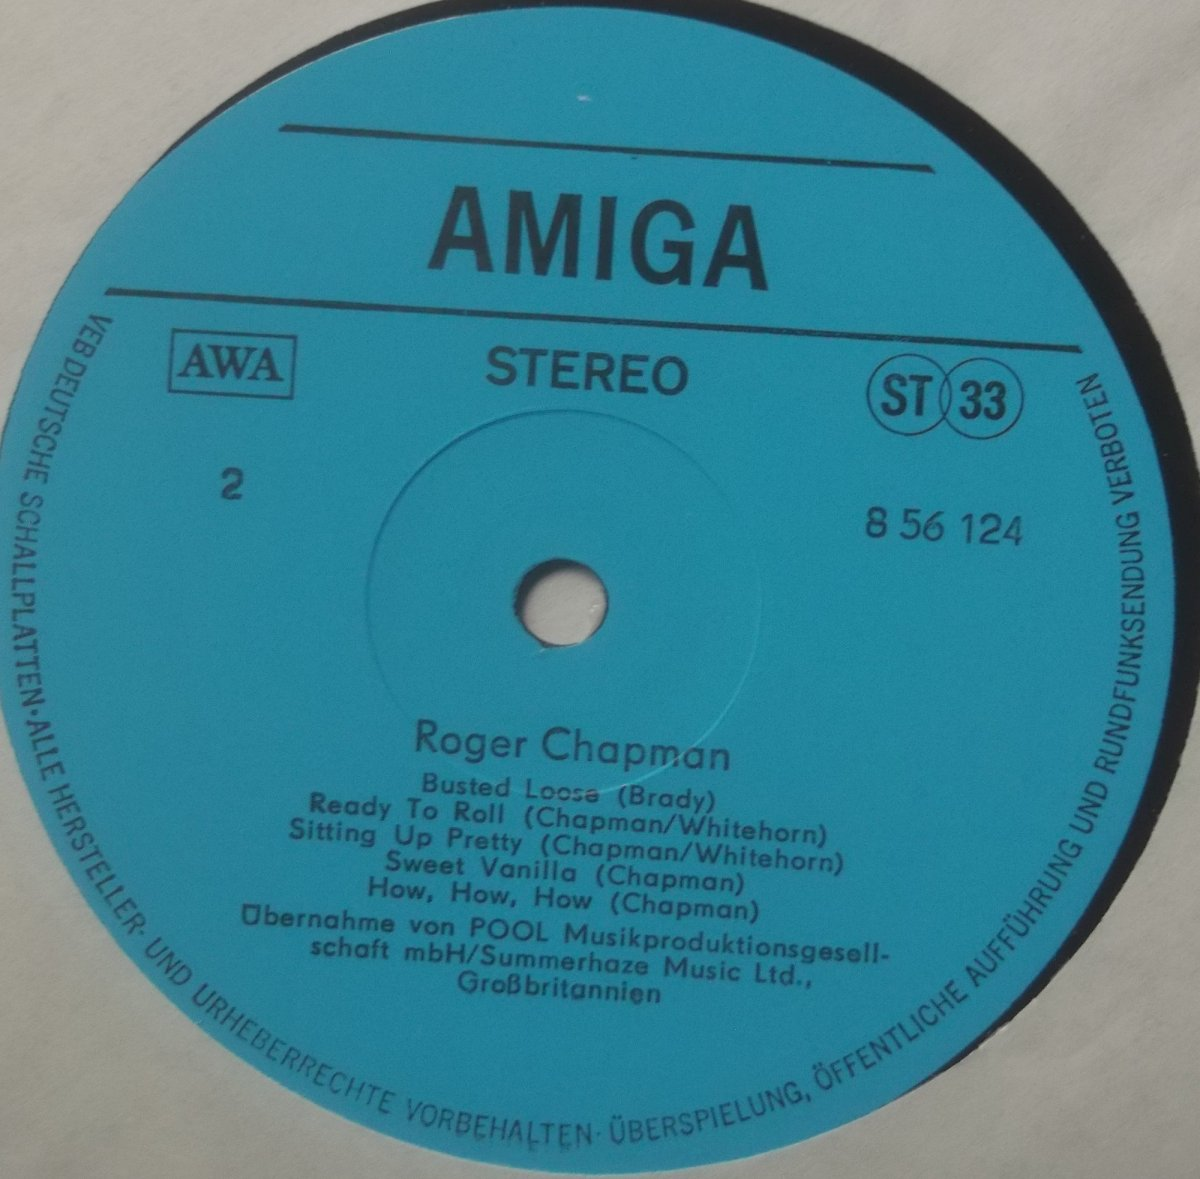 Roger Chapman – Roger Chapman